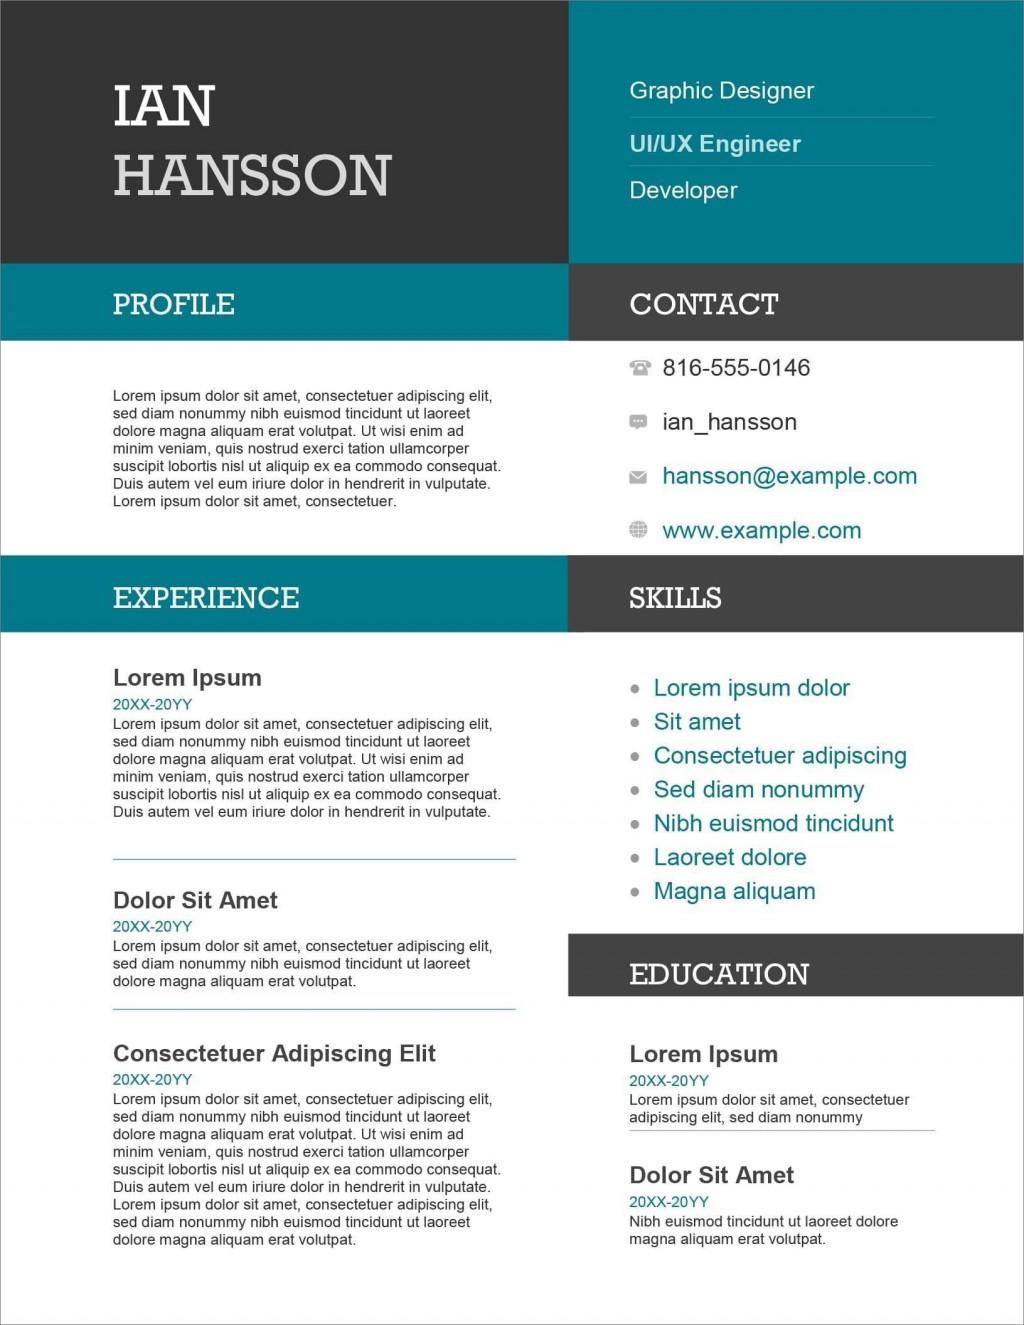 005 Formidable Microsoft Word Resume Template Image  Reddit 2019 2010 Free DownloadLarge